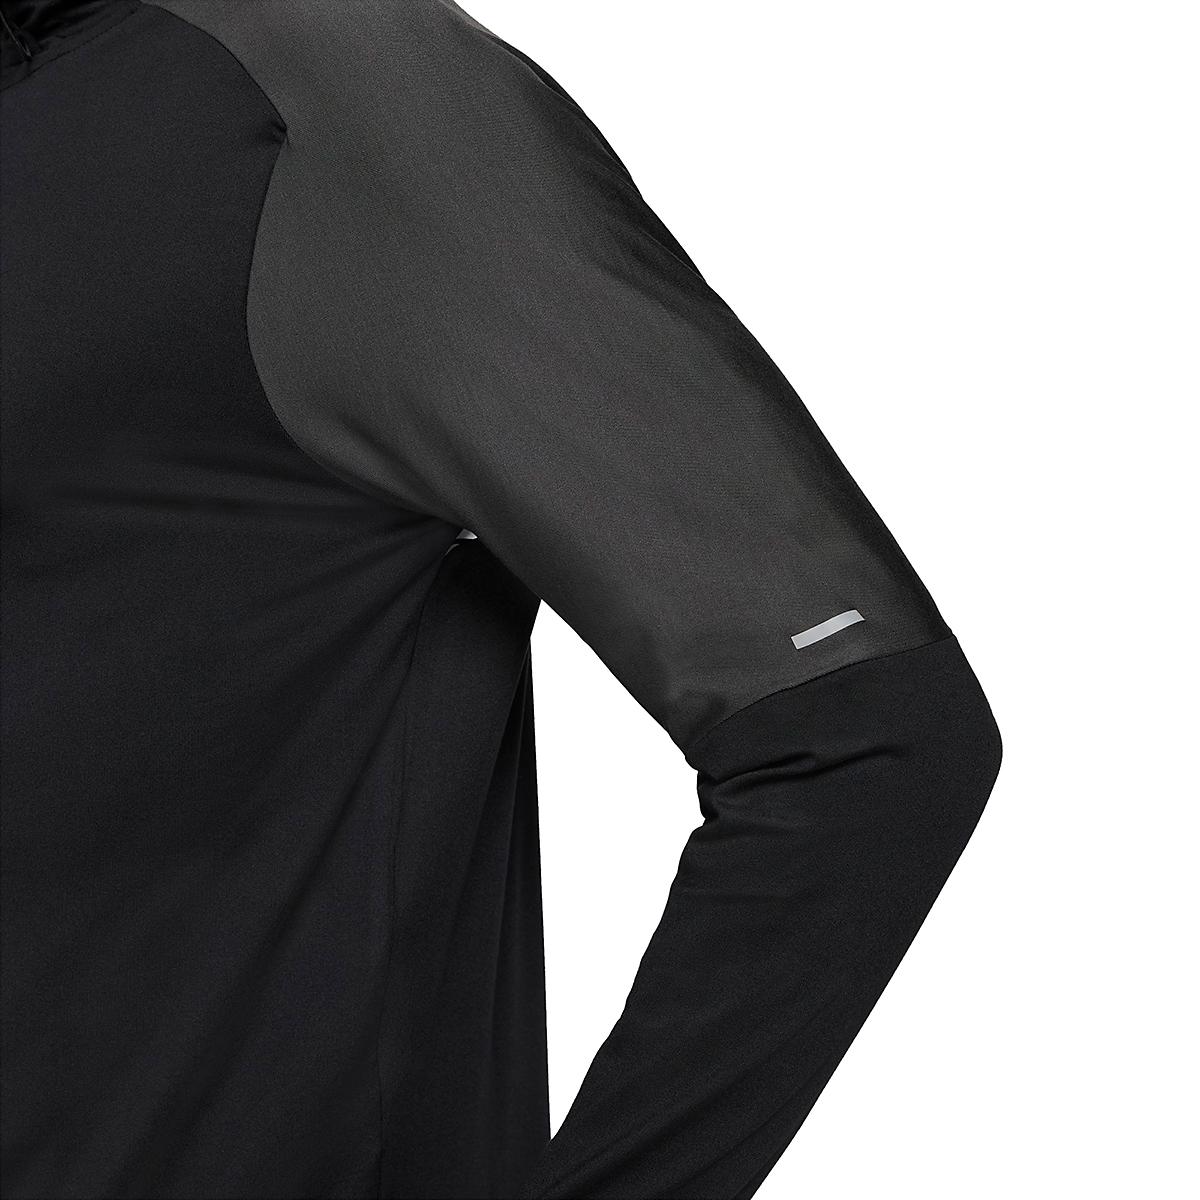 Men's Nike Dri-FIT Element 1/2-Zip Trail Running Top - Color: Black/Black/Dark Smoke Grey/White - Size: XS, Black/Black/Dark Smoke Grey/White, large, image 7